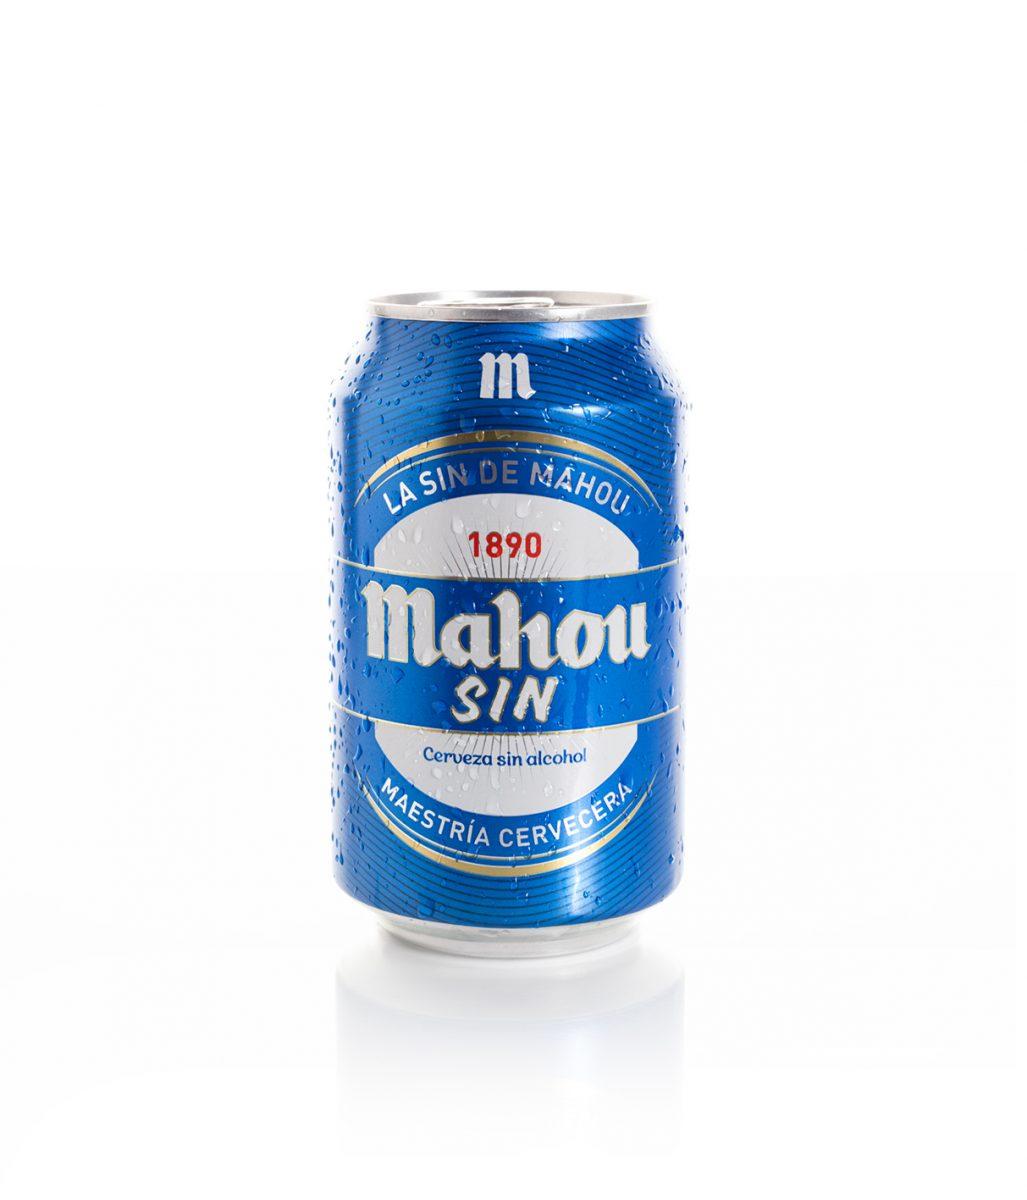 Cerveza Sin alcohol. Bebidas. Catering online Madrid